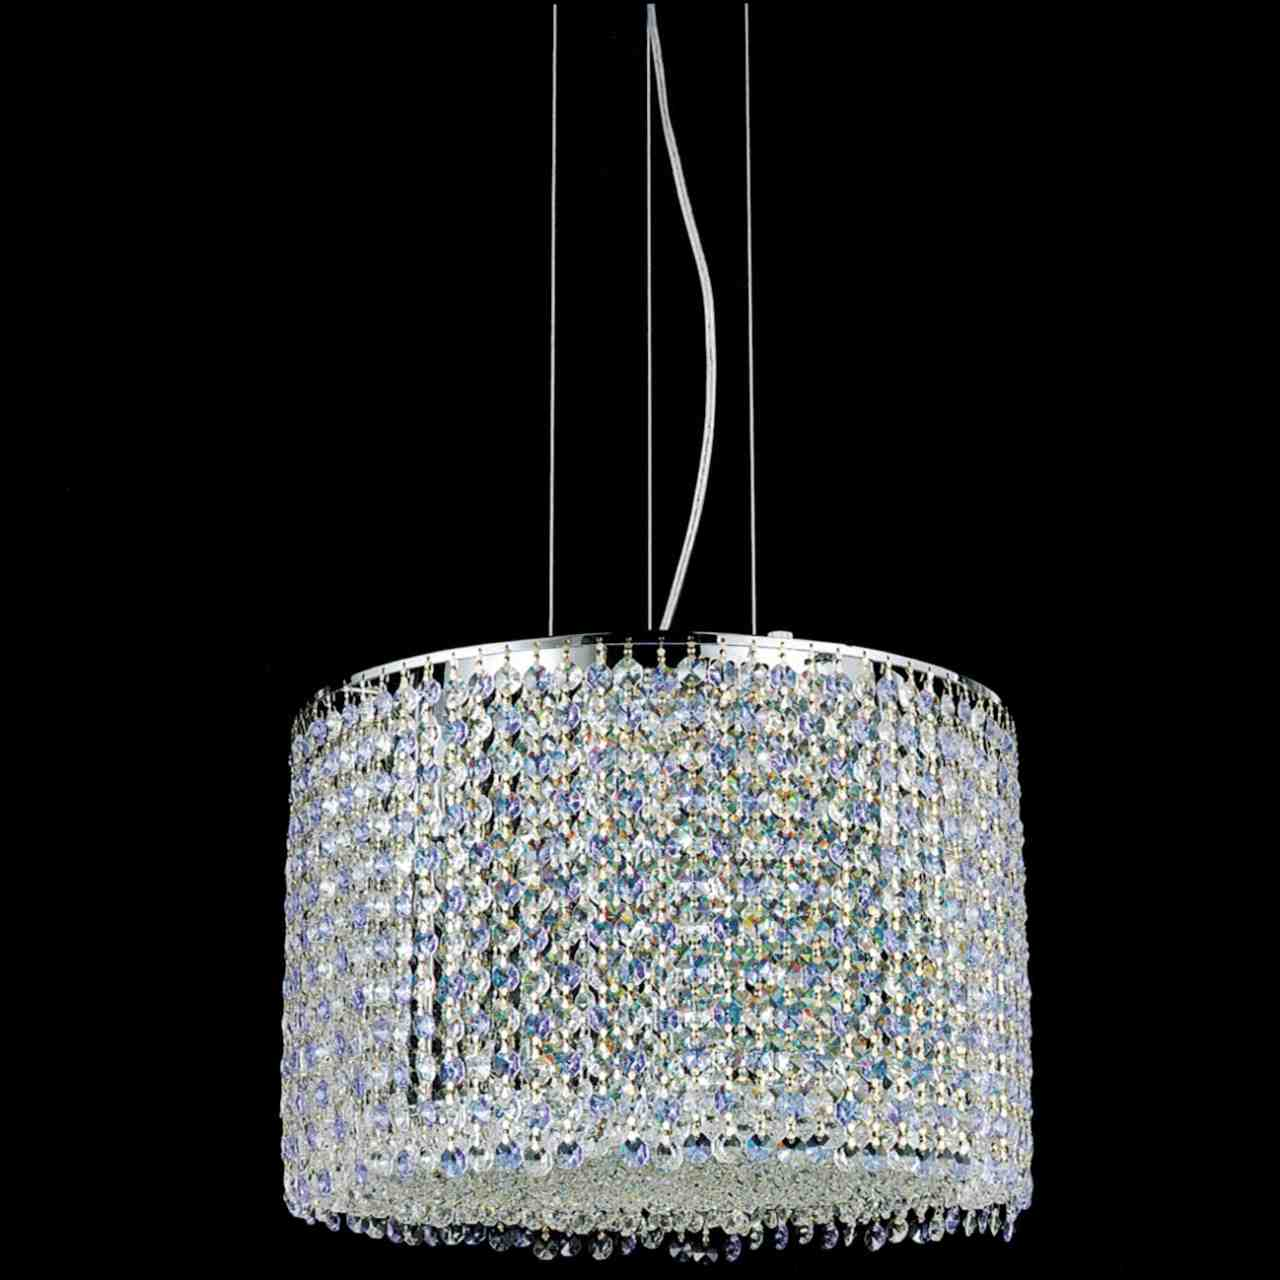 Brizzo Lighting Stores 16 Rainbow Modern Round Crystal